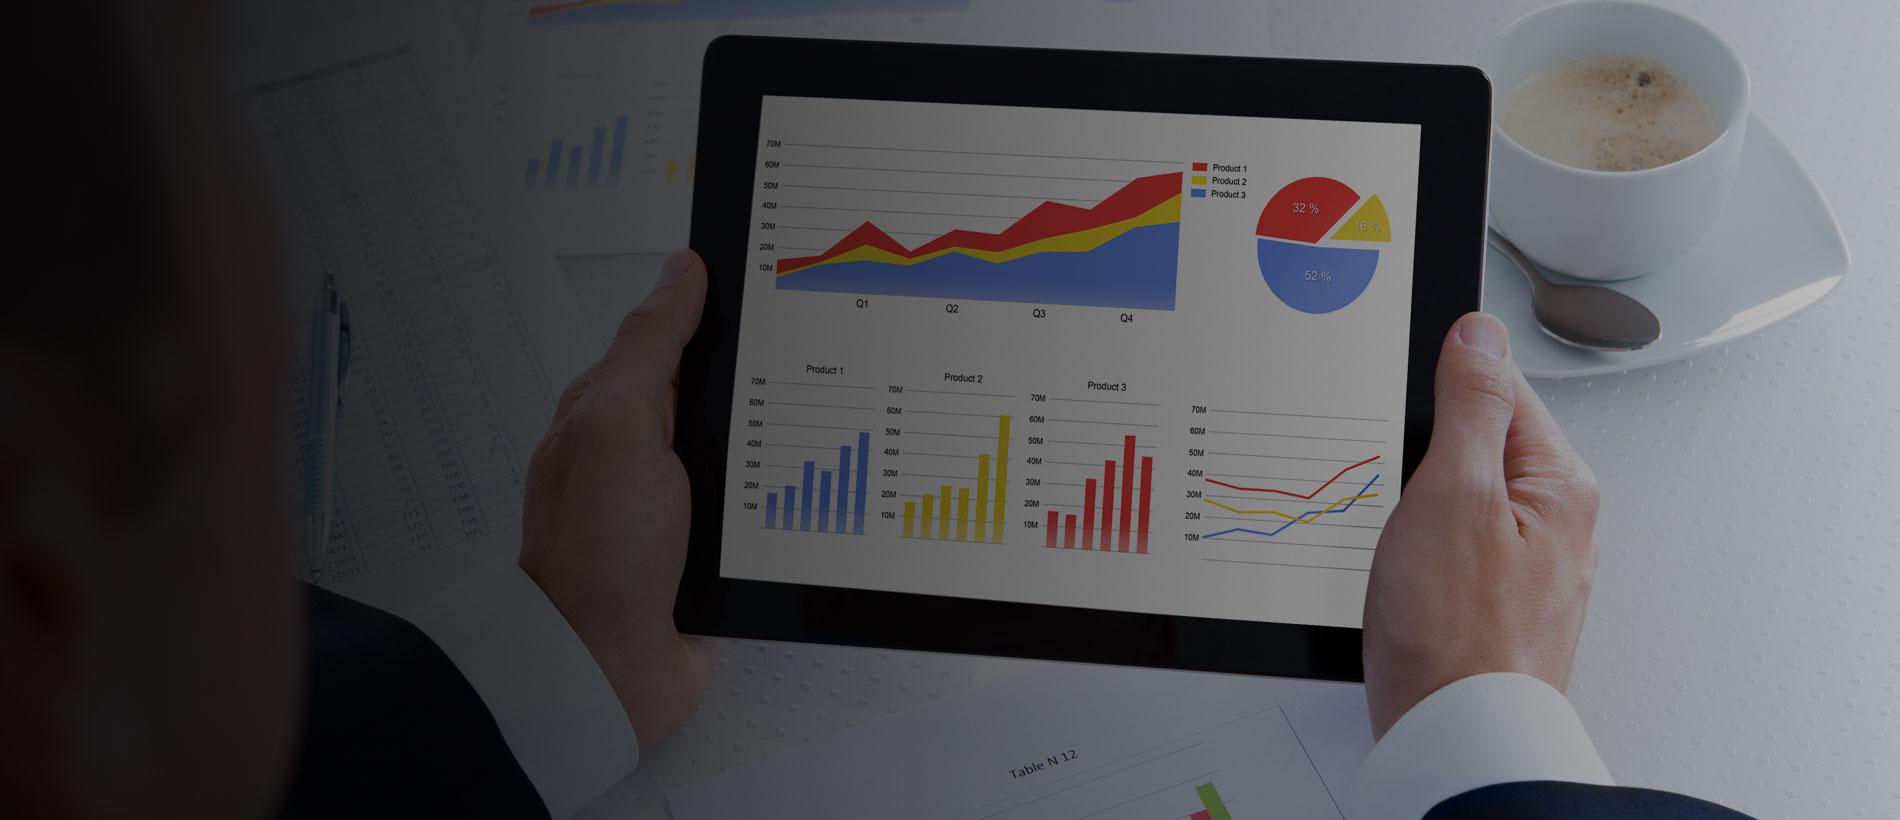 A retail dashboard showing  retail analytics